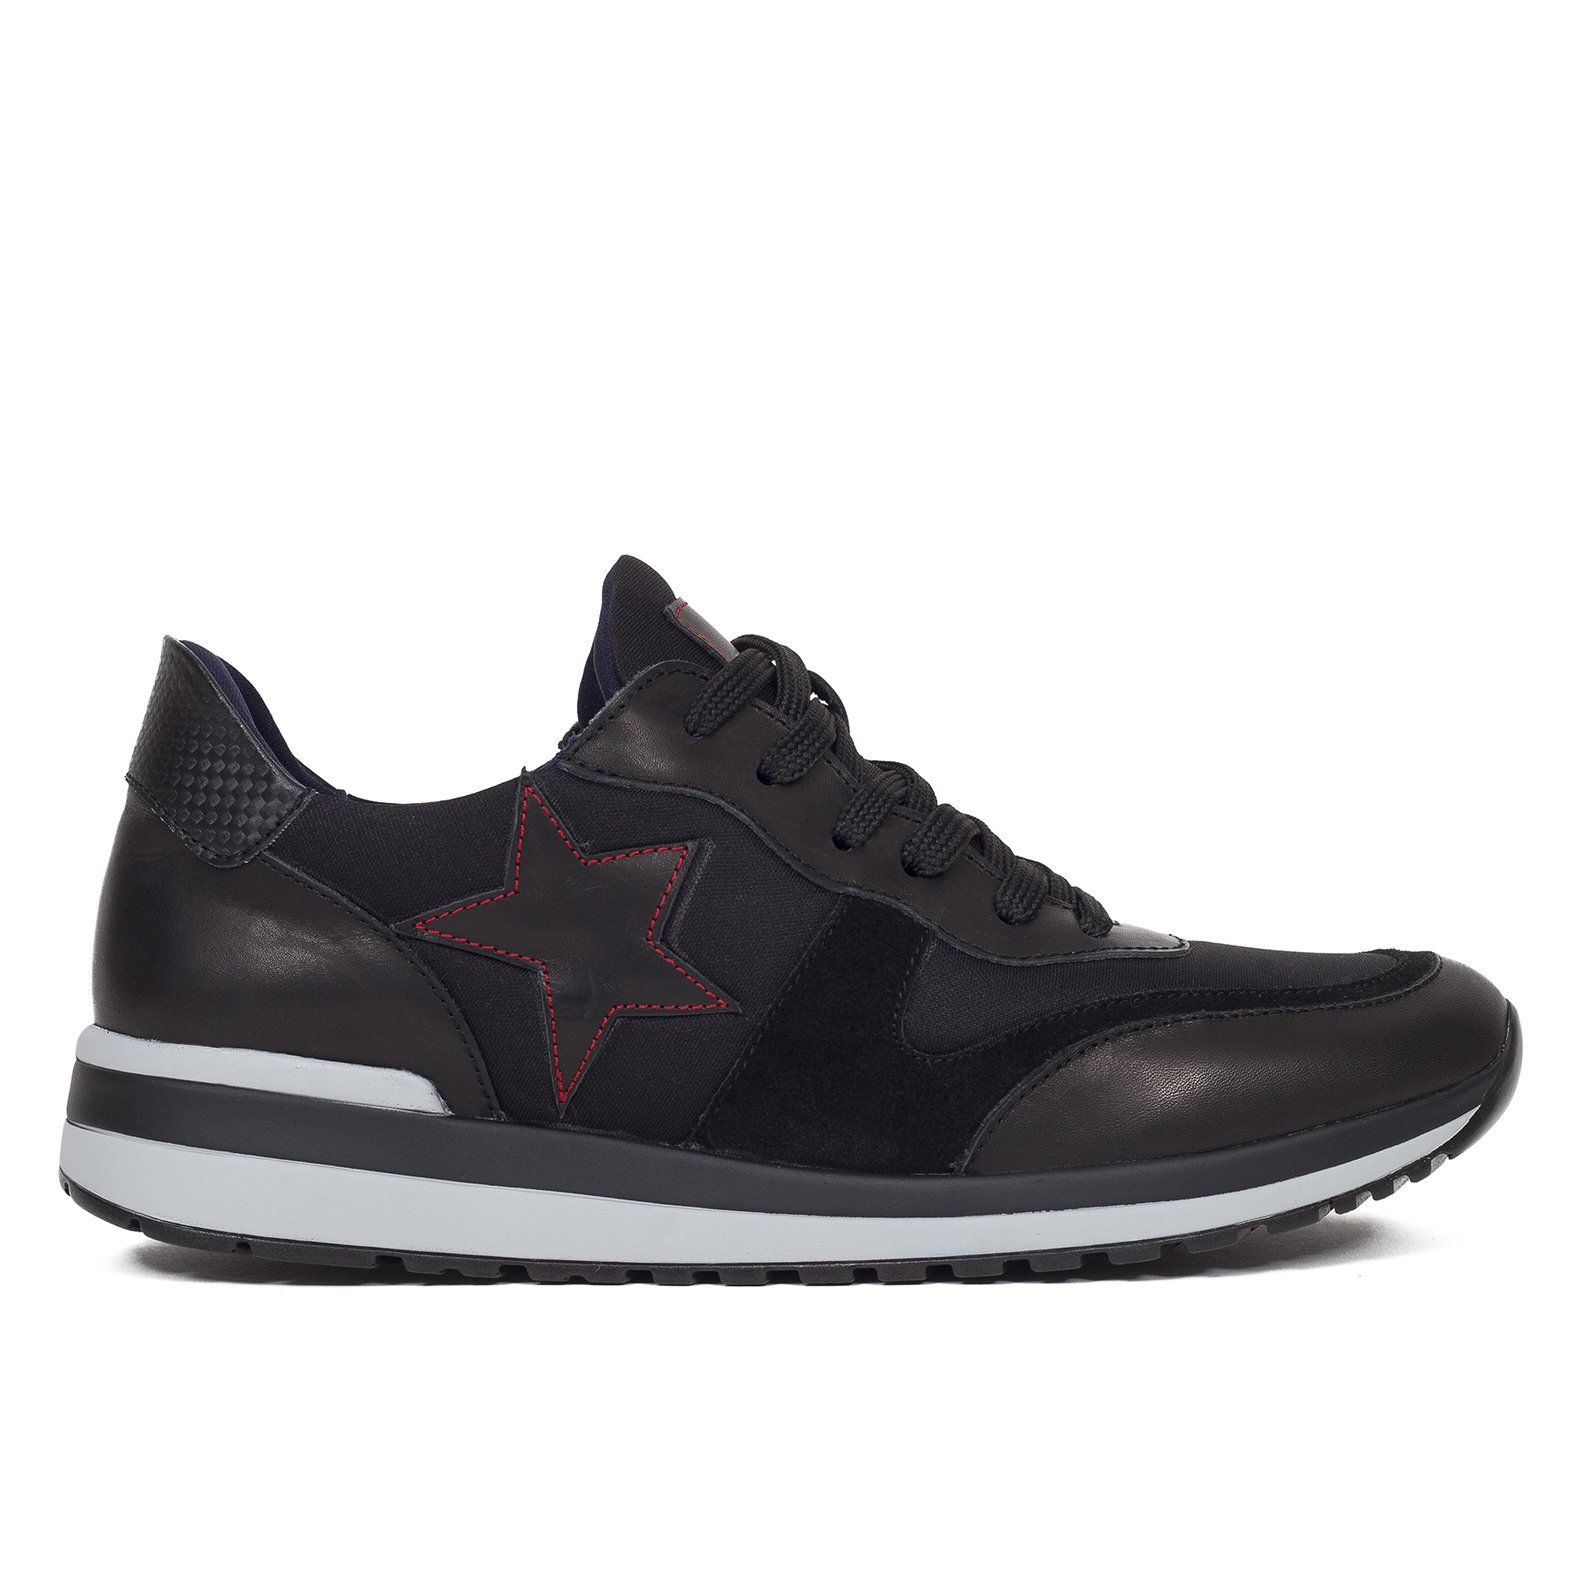 ba064ee16b2 Zapato hombre deportivo NEGRO - Zapatos online miMaO – miMaO ShopOnline